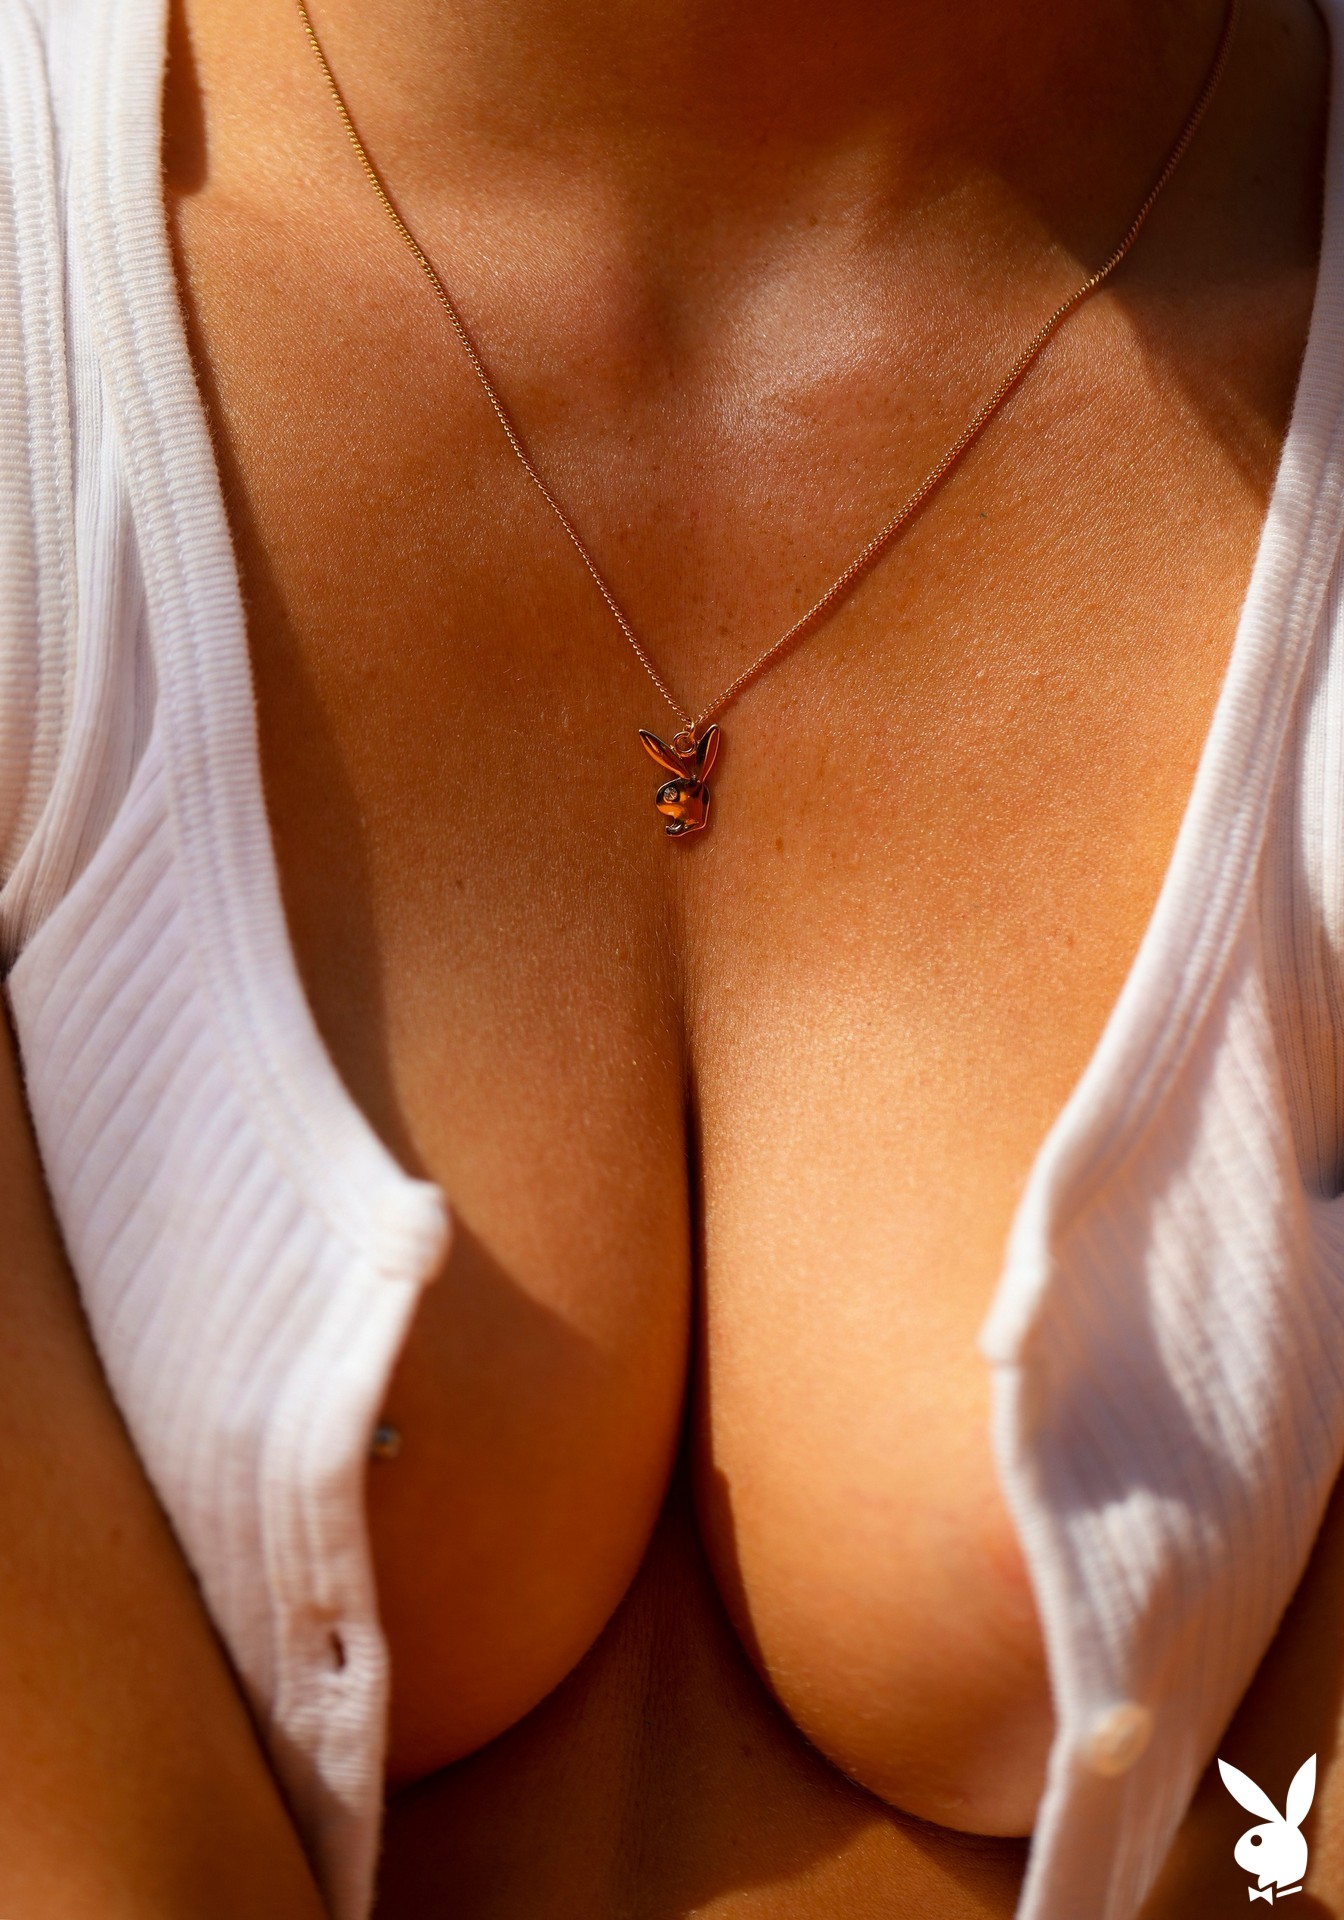 Svenja For Playboy International Playboy Plus (3)